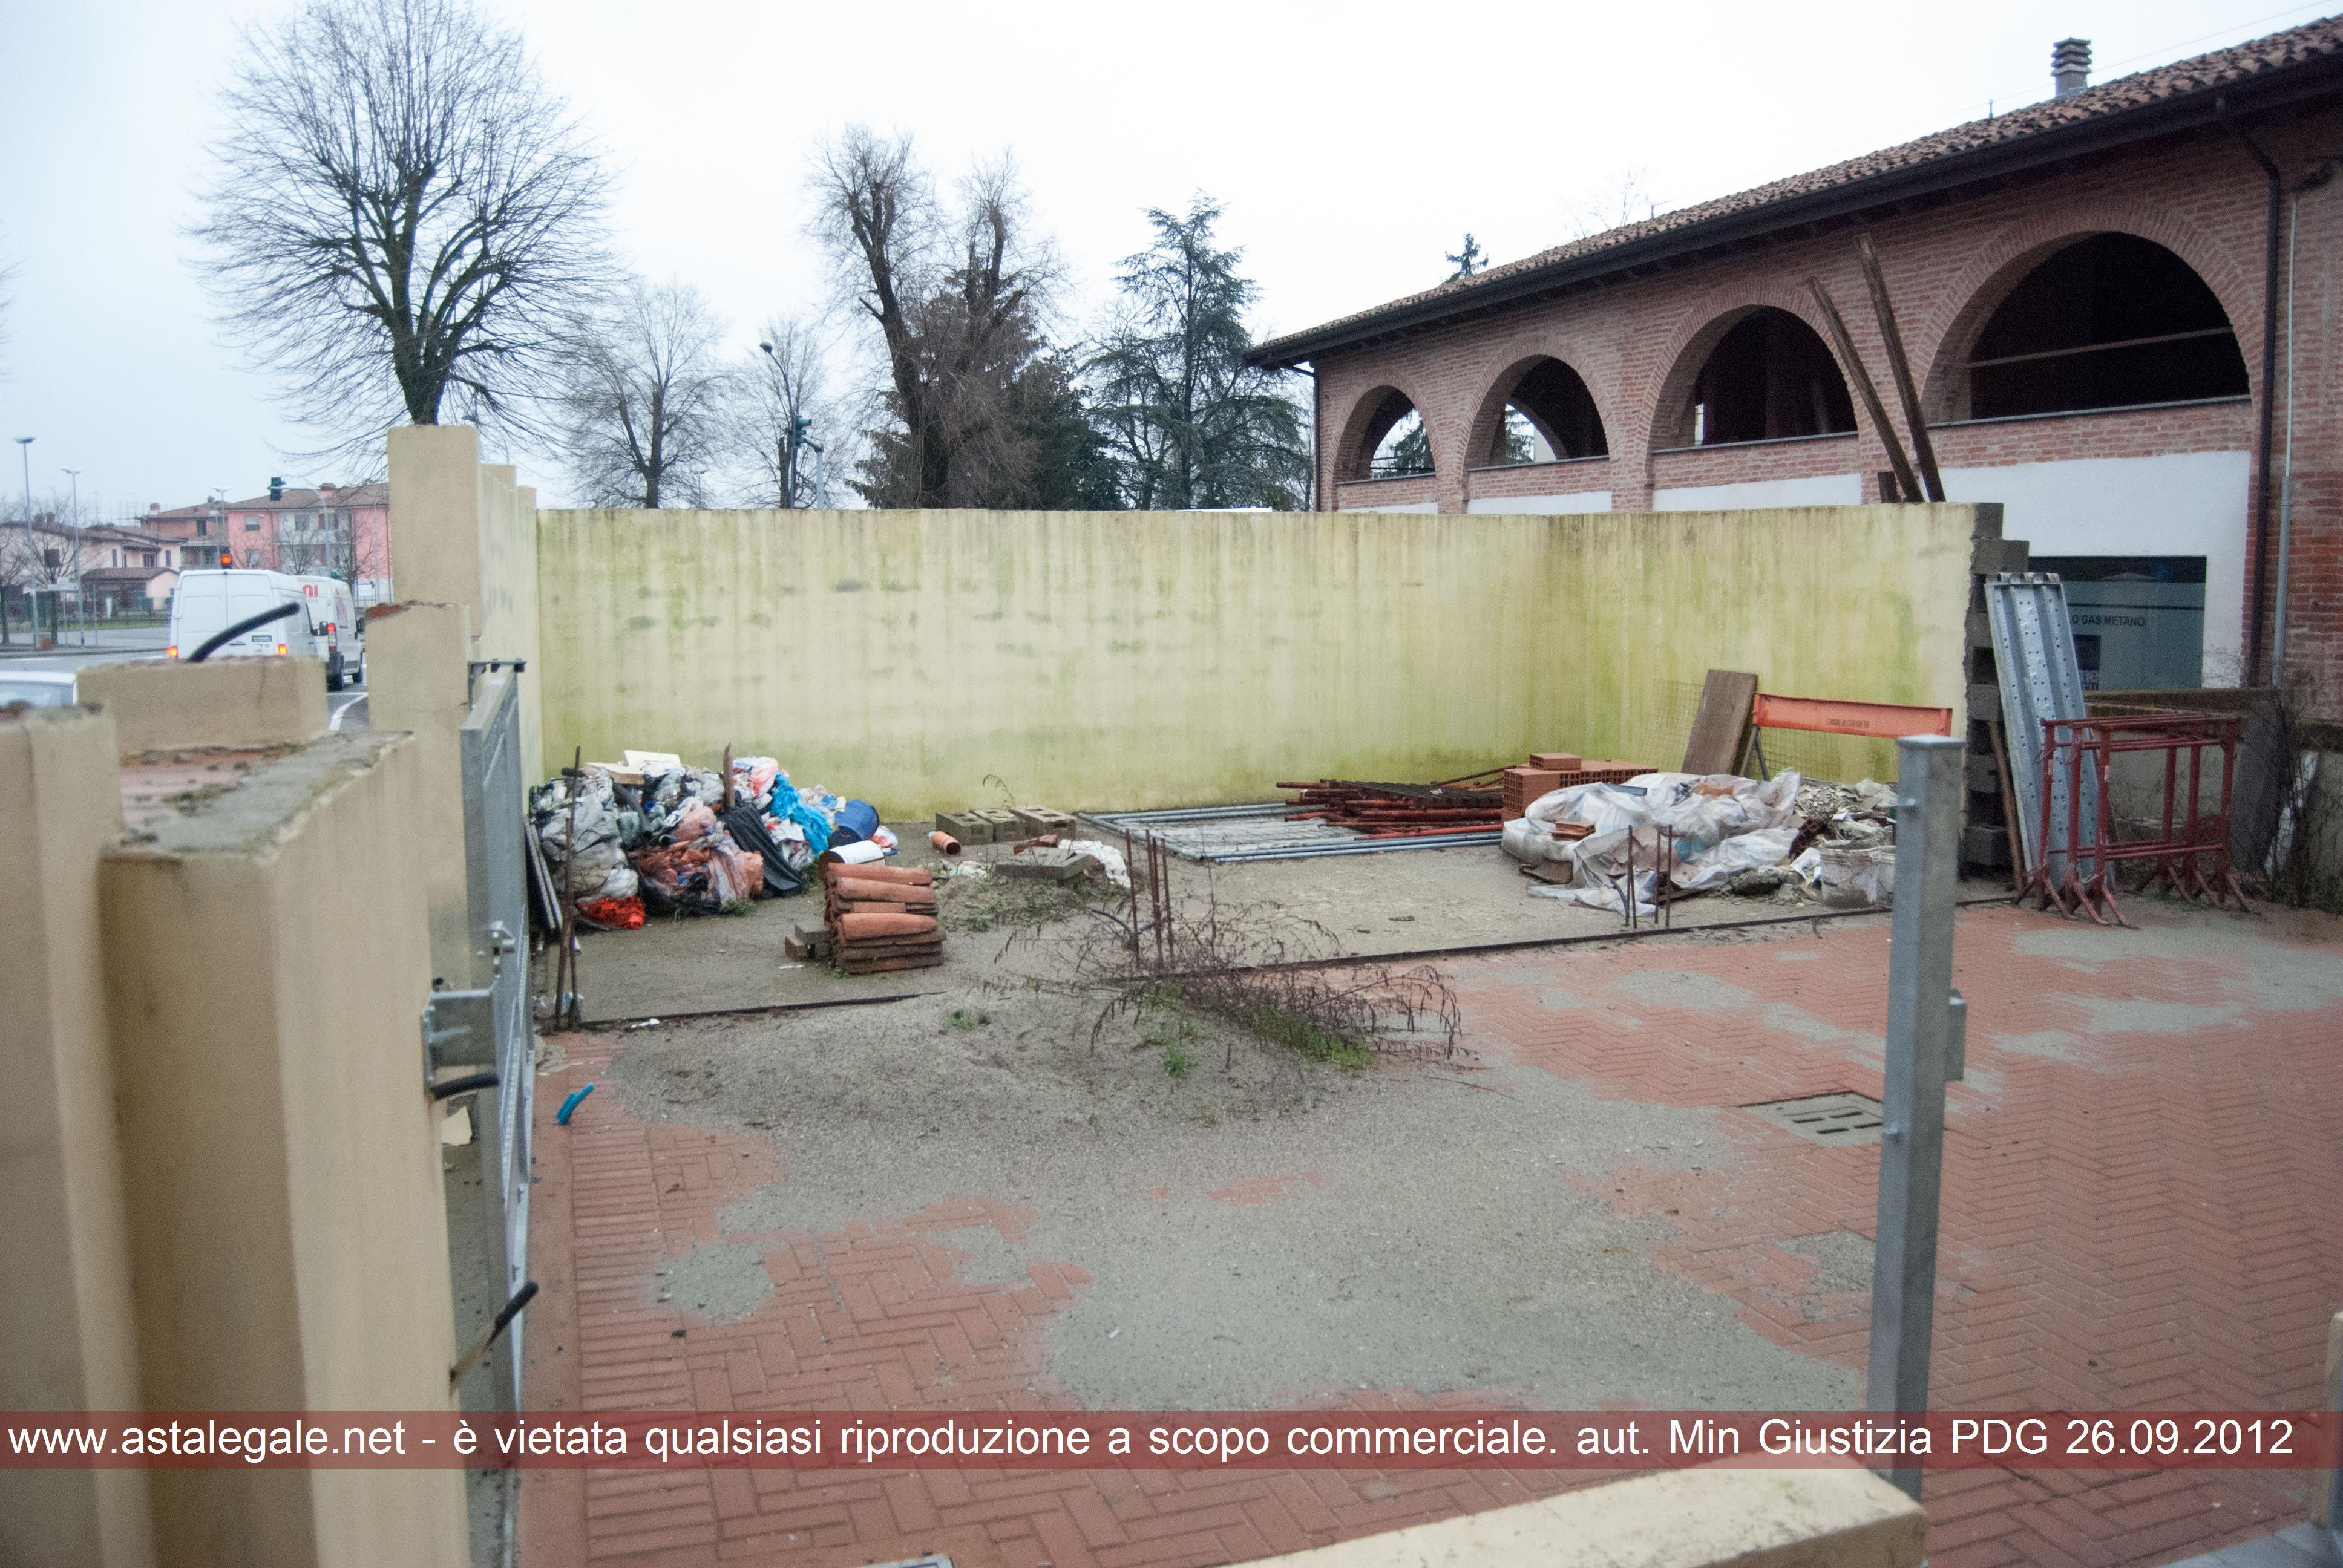 Caorso (PC) Via Roma, 22 ang. Via Garibaldi, 1